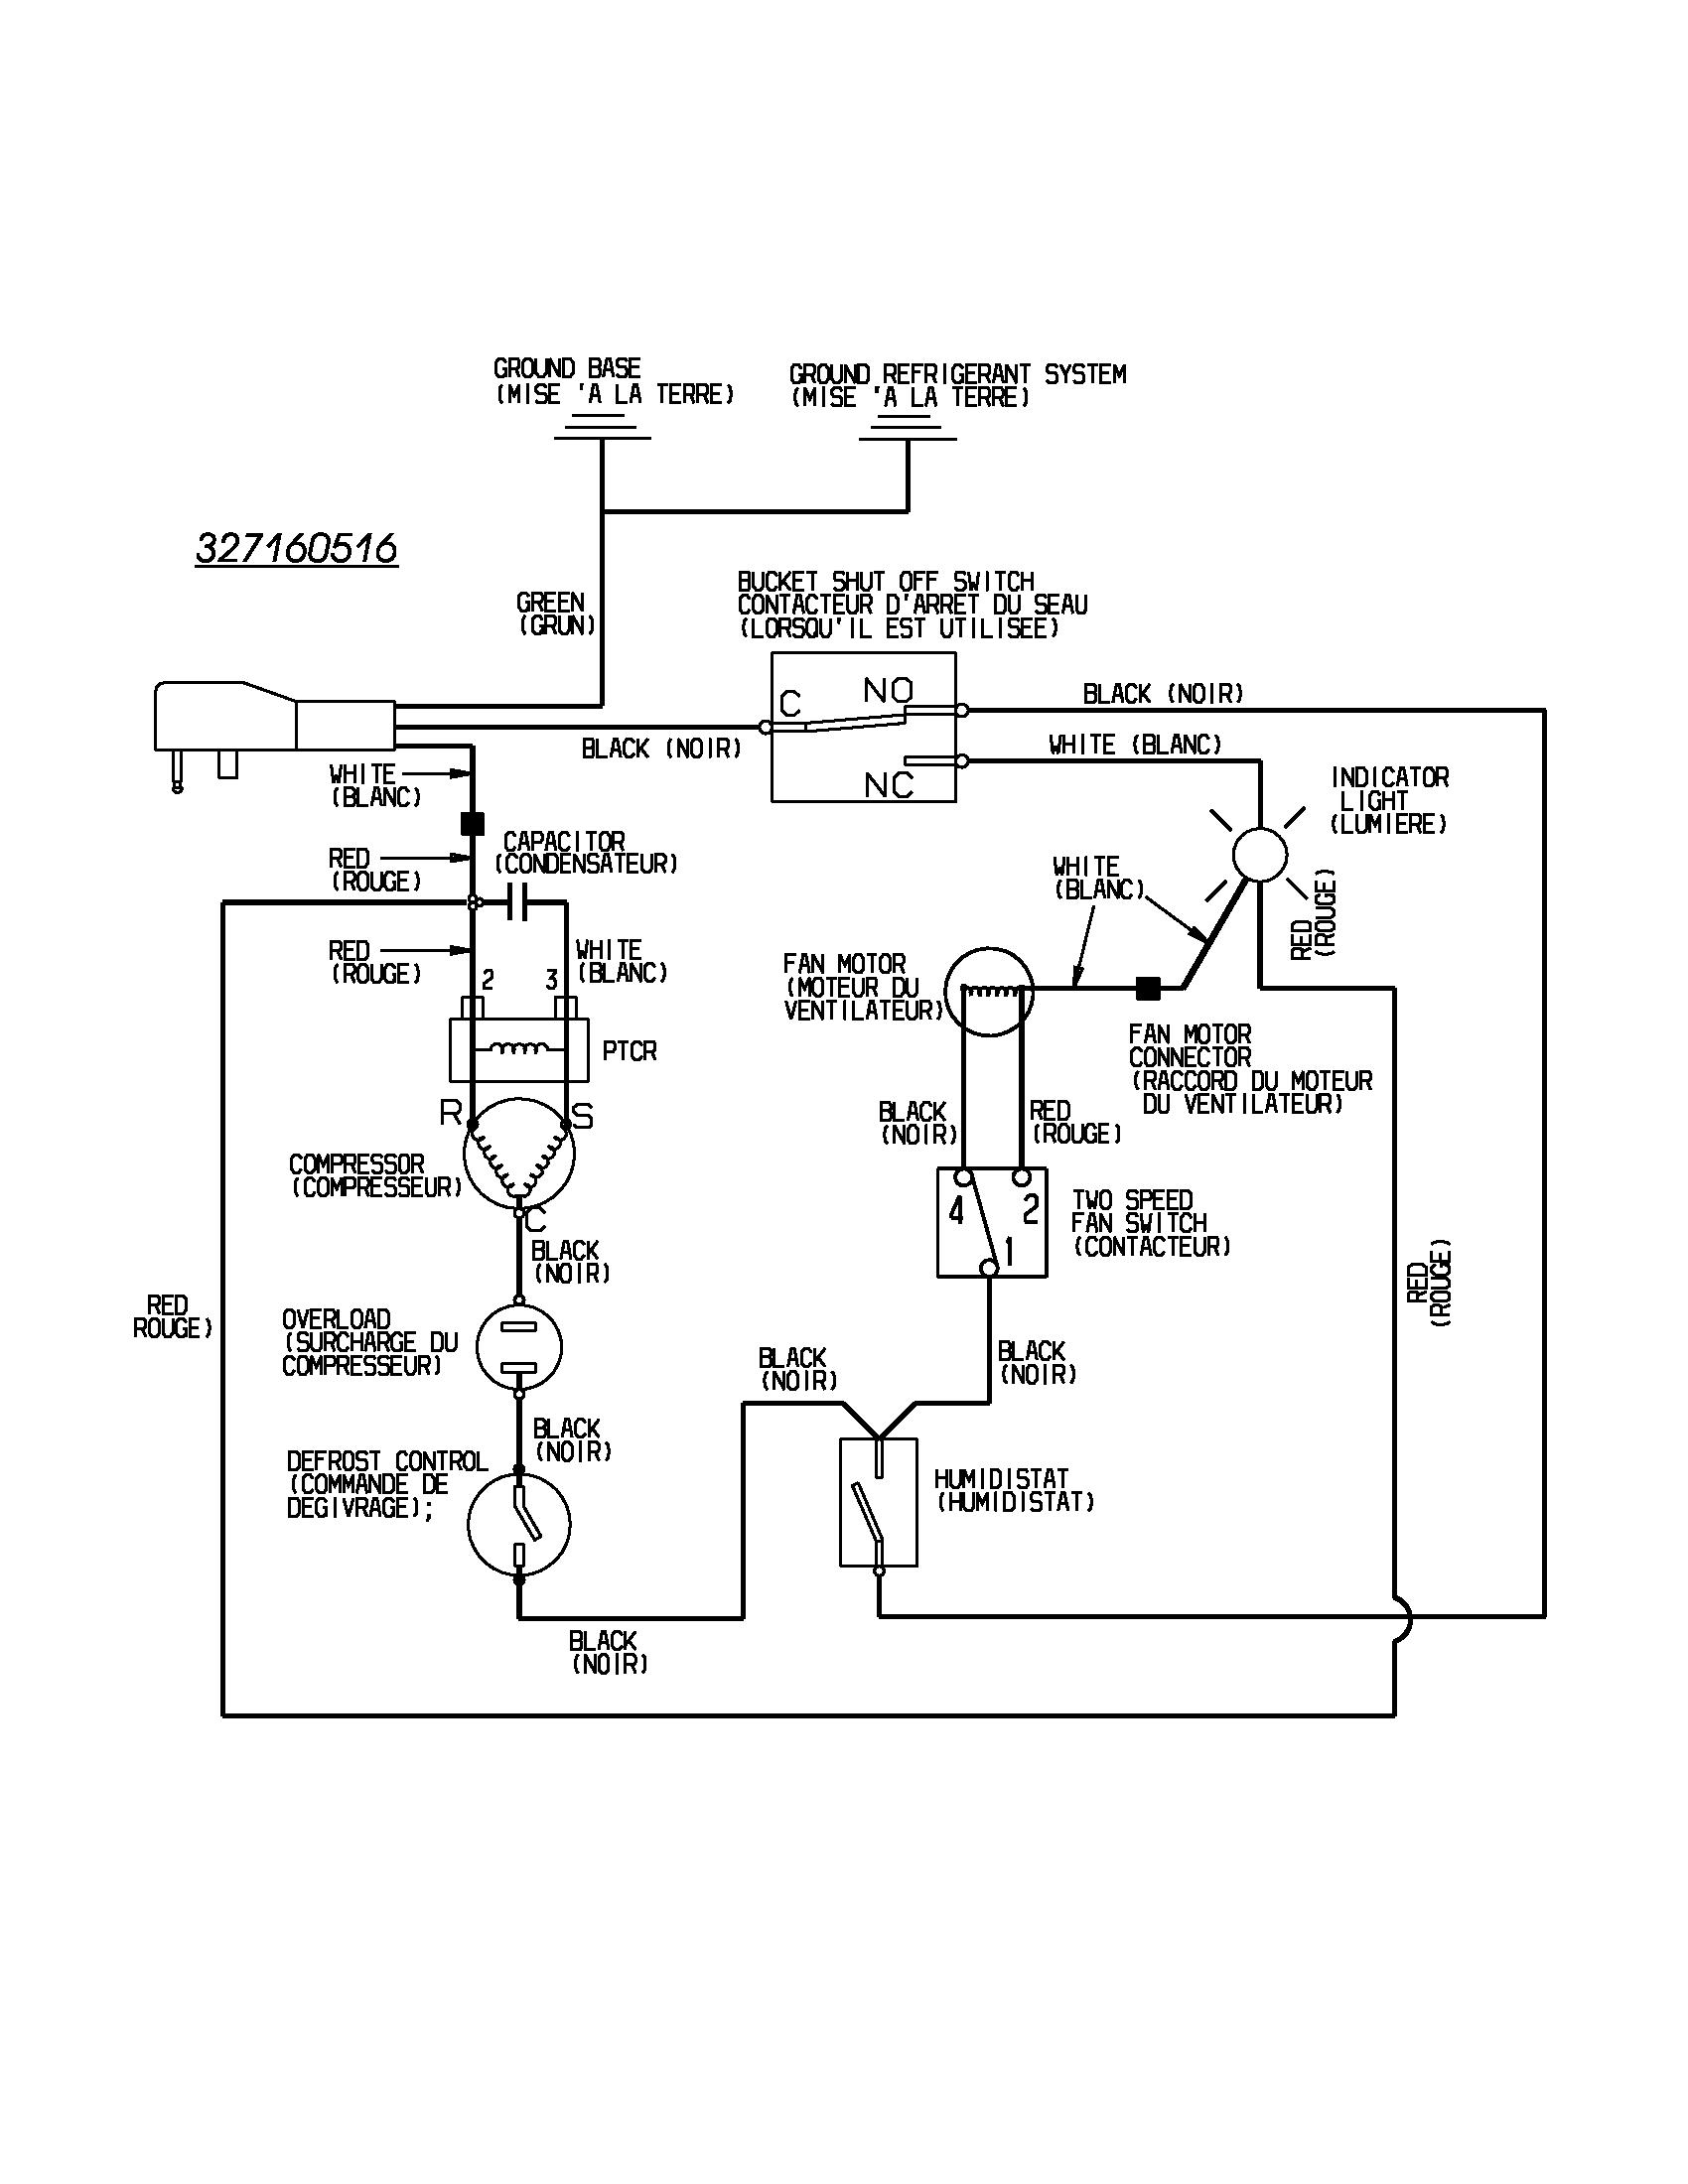 3126 caterpillar wiring diagrams